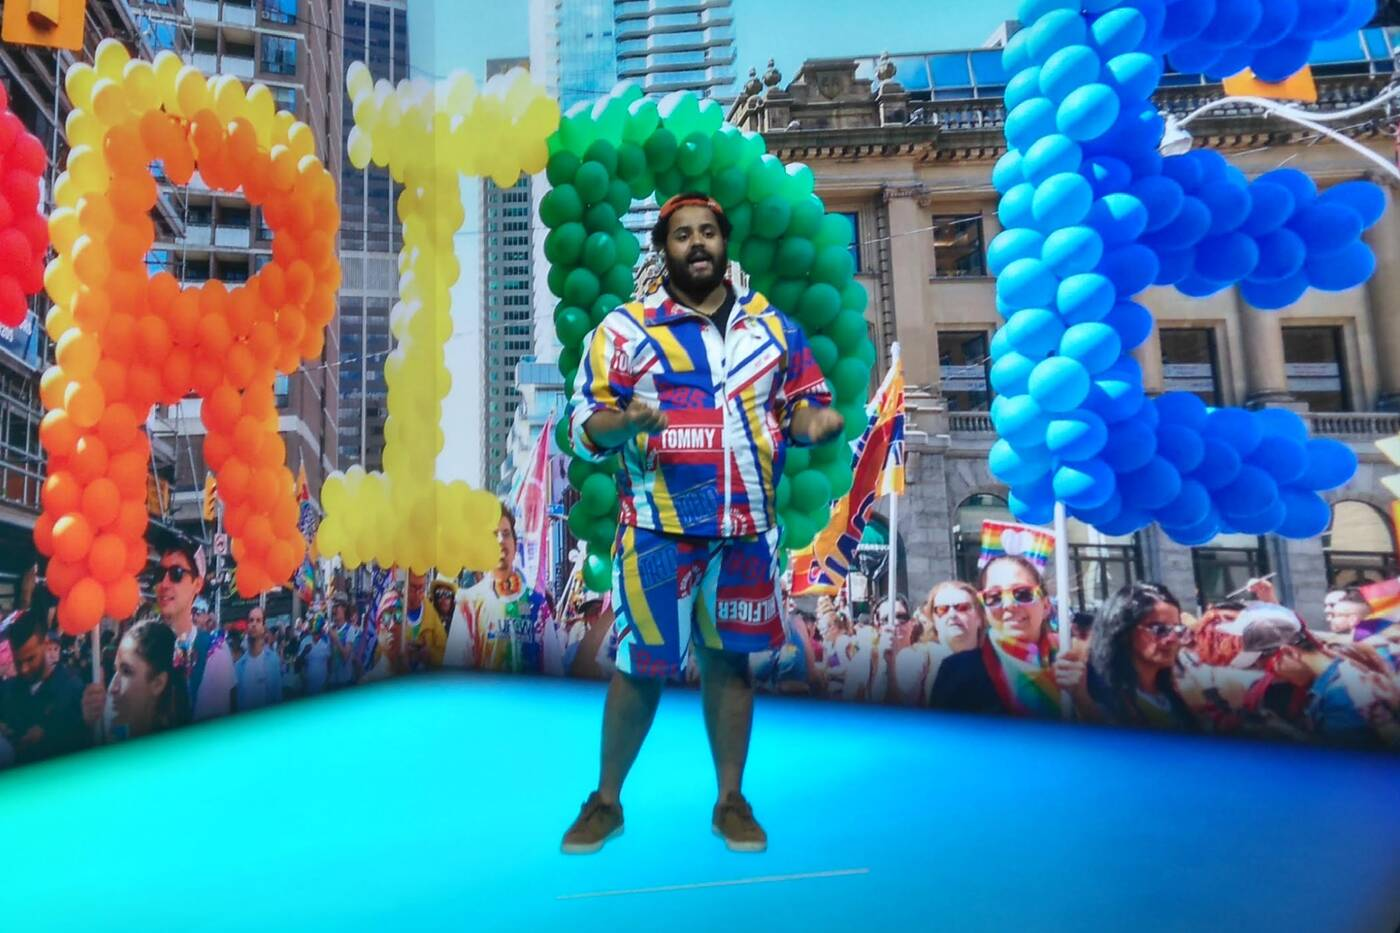 LGBTQ toronto